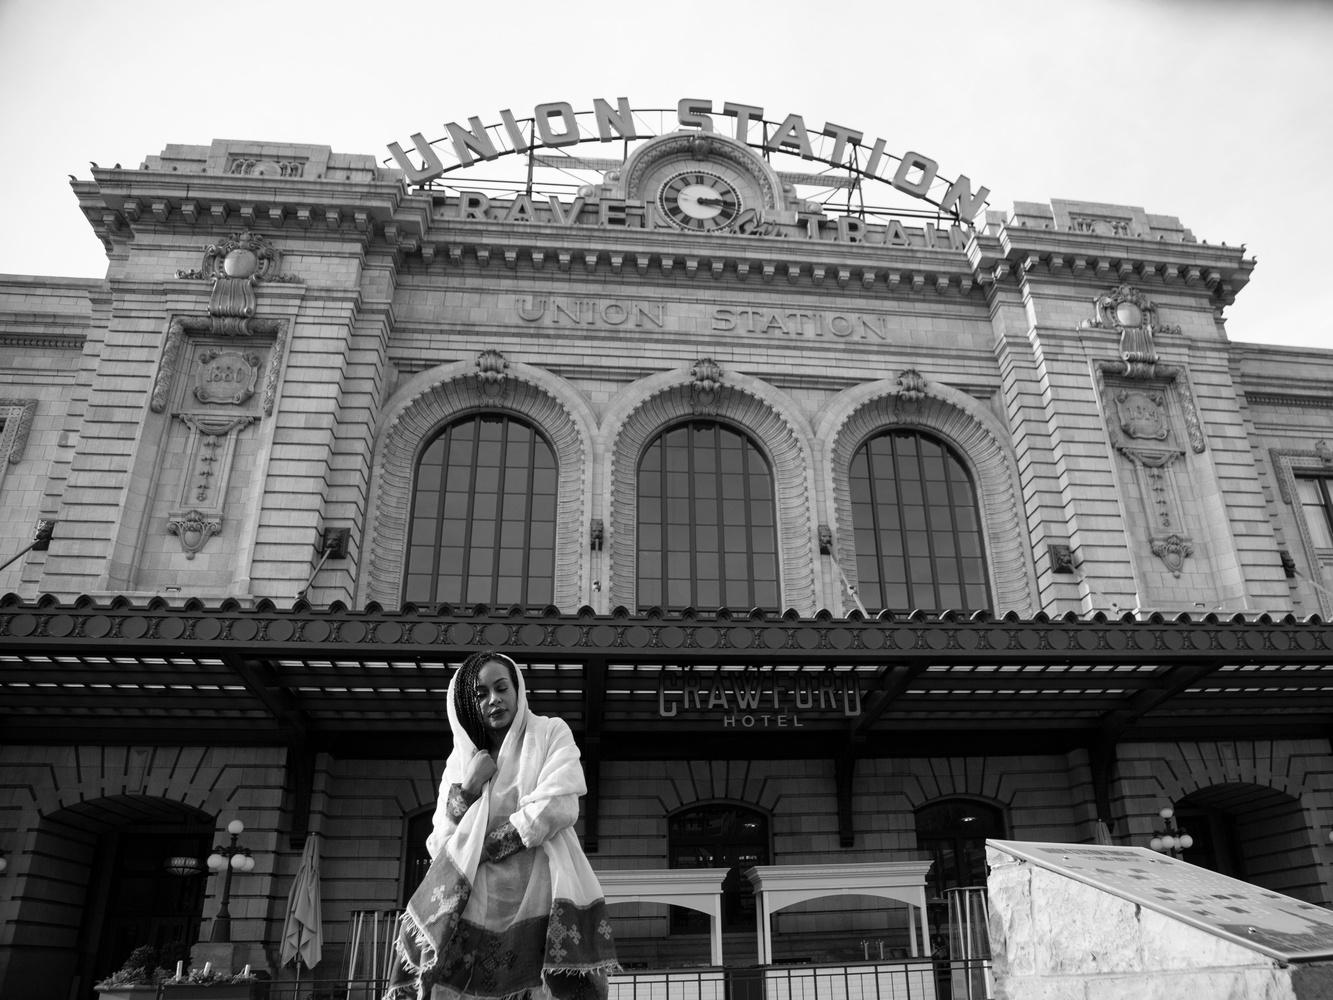 Union Station by darin gabbert